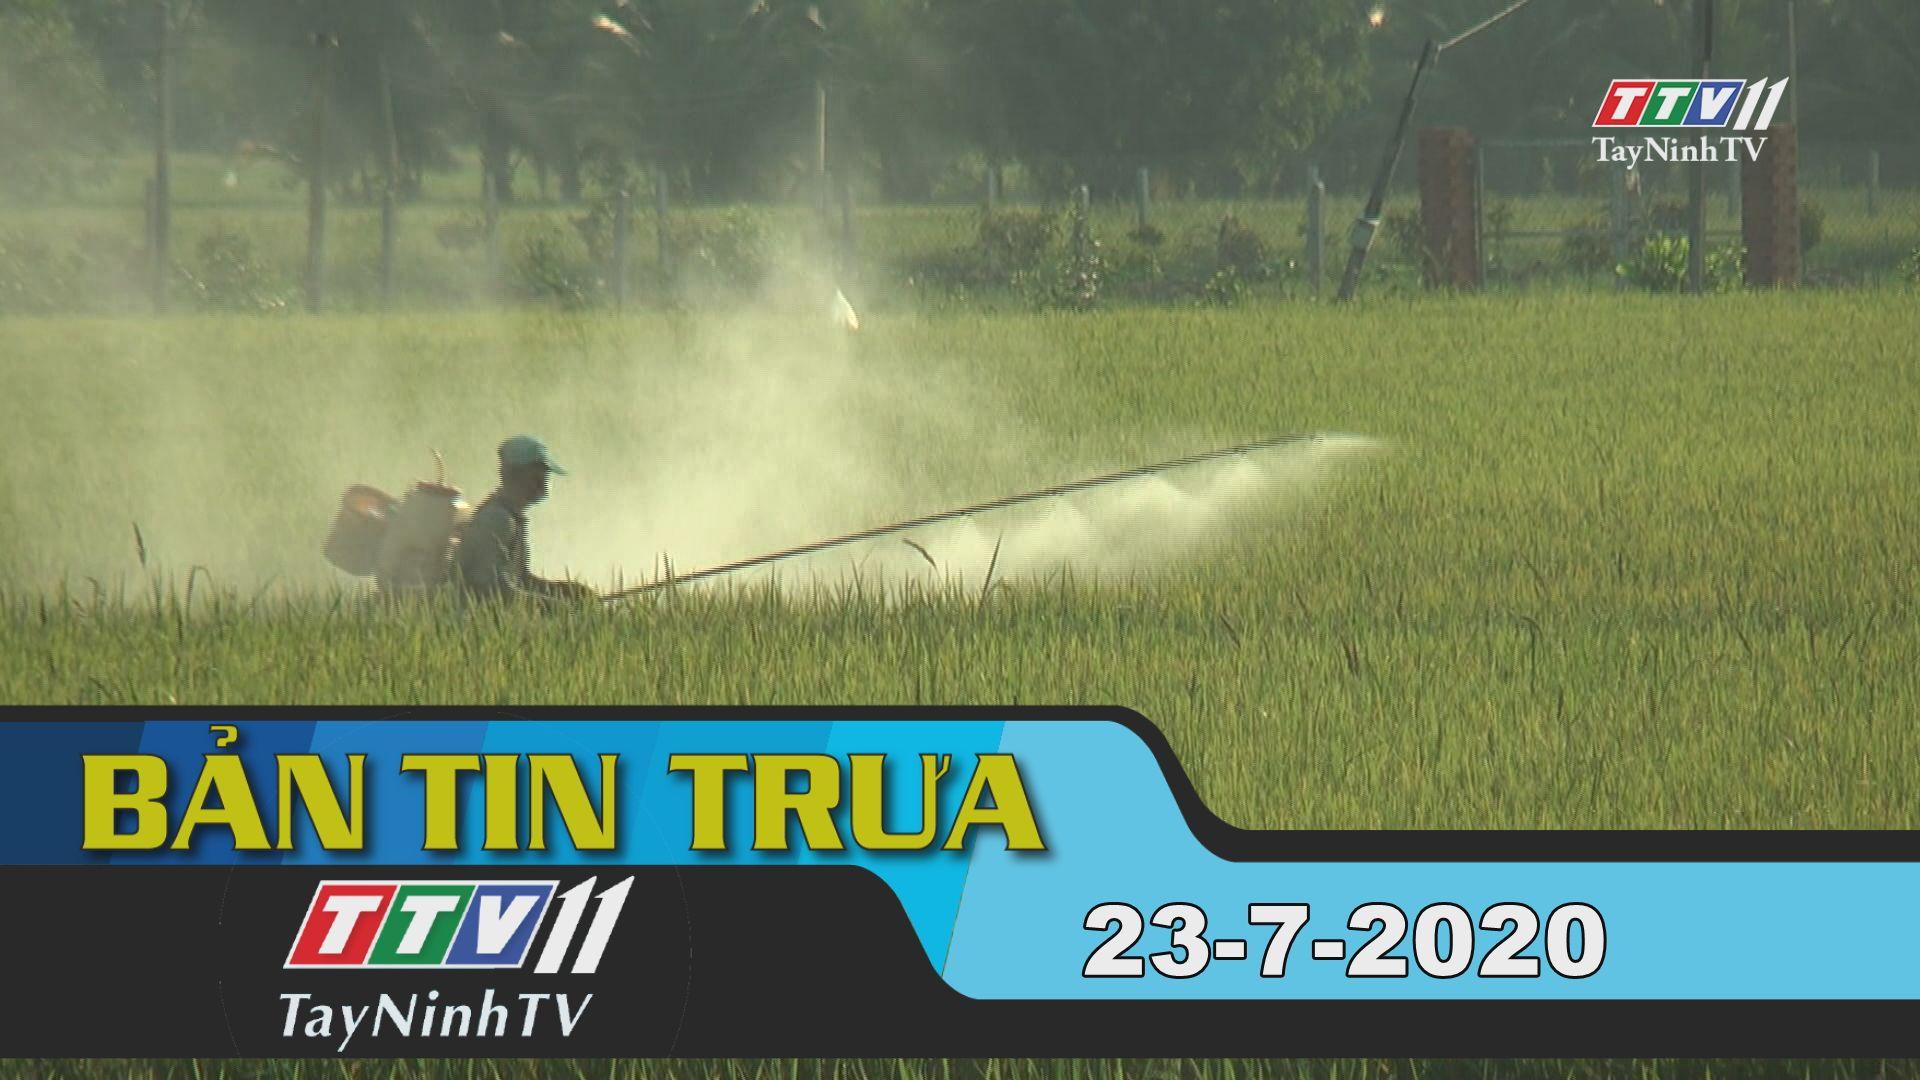 Bản tin trưa 23-7-2020 | Tin tức hôm nay | TayNinhTV